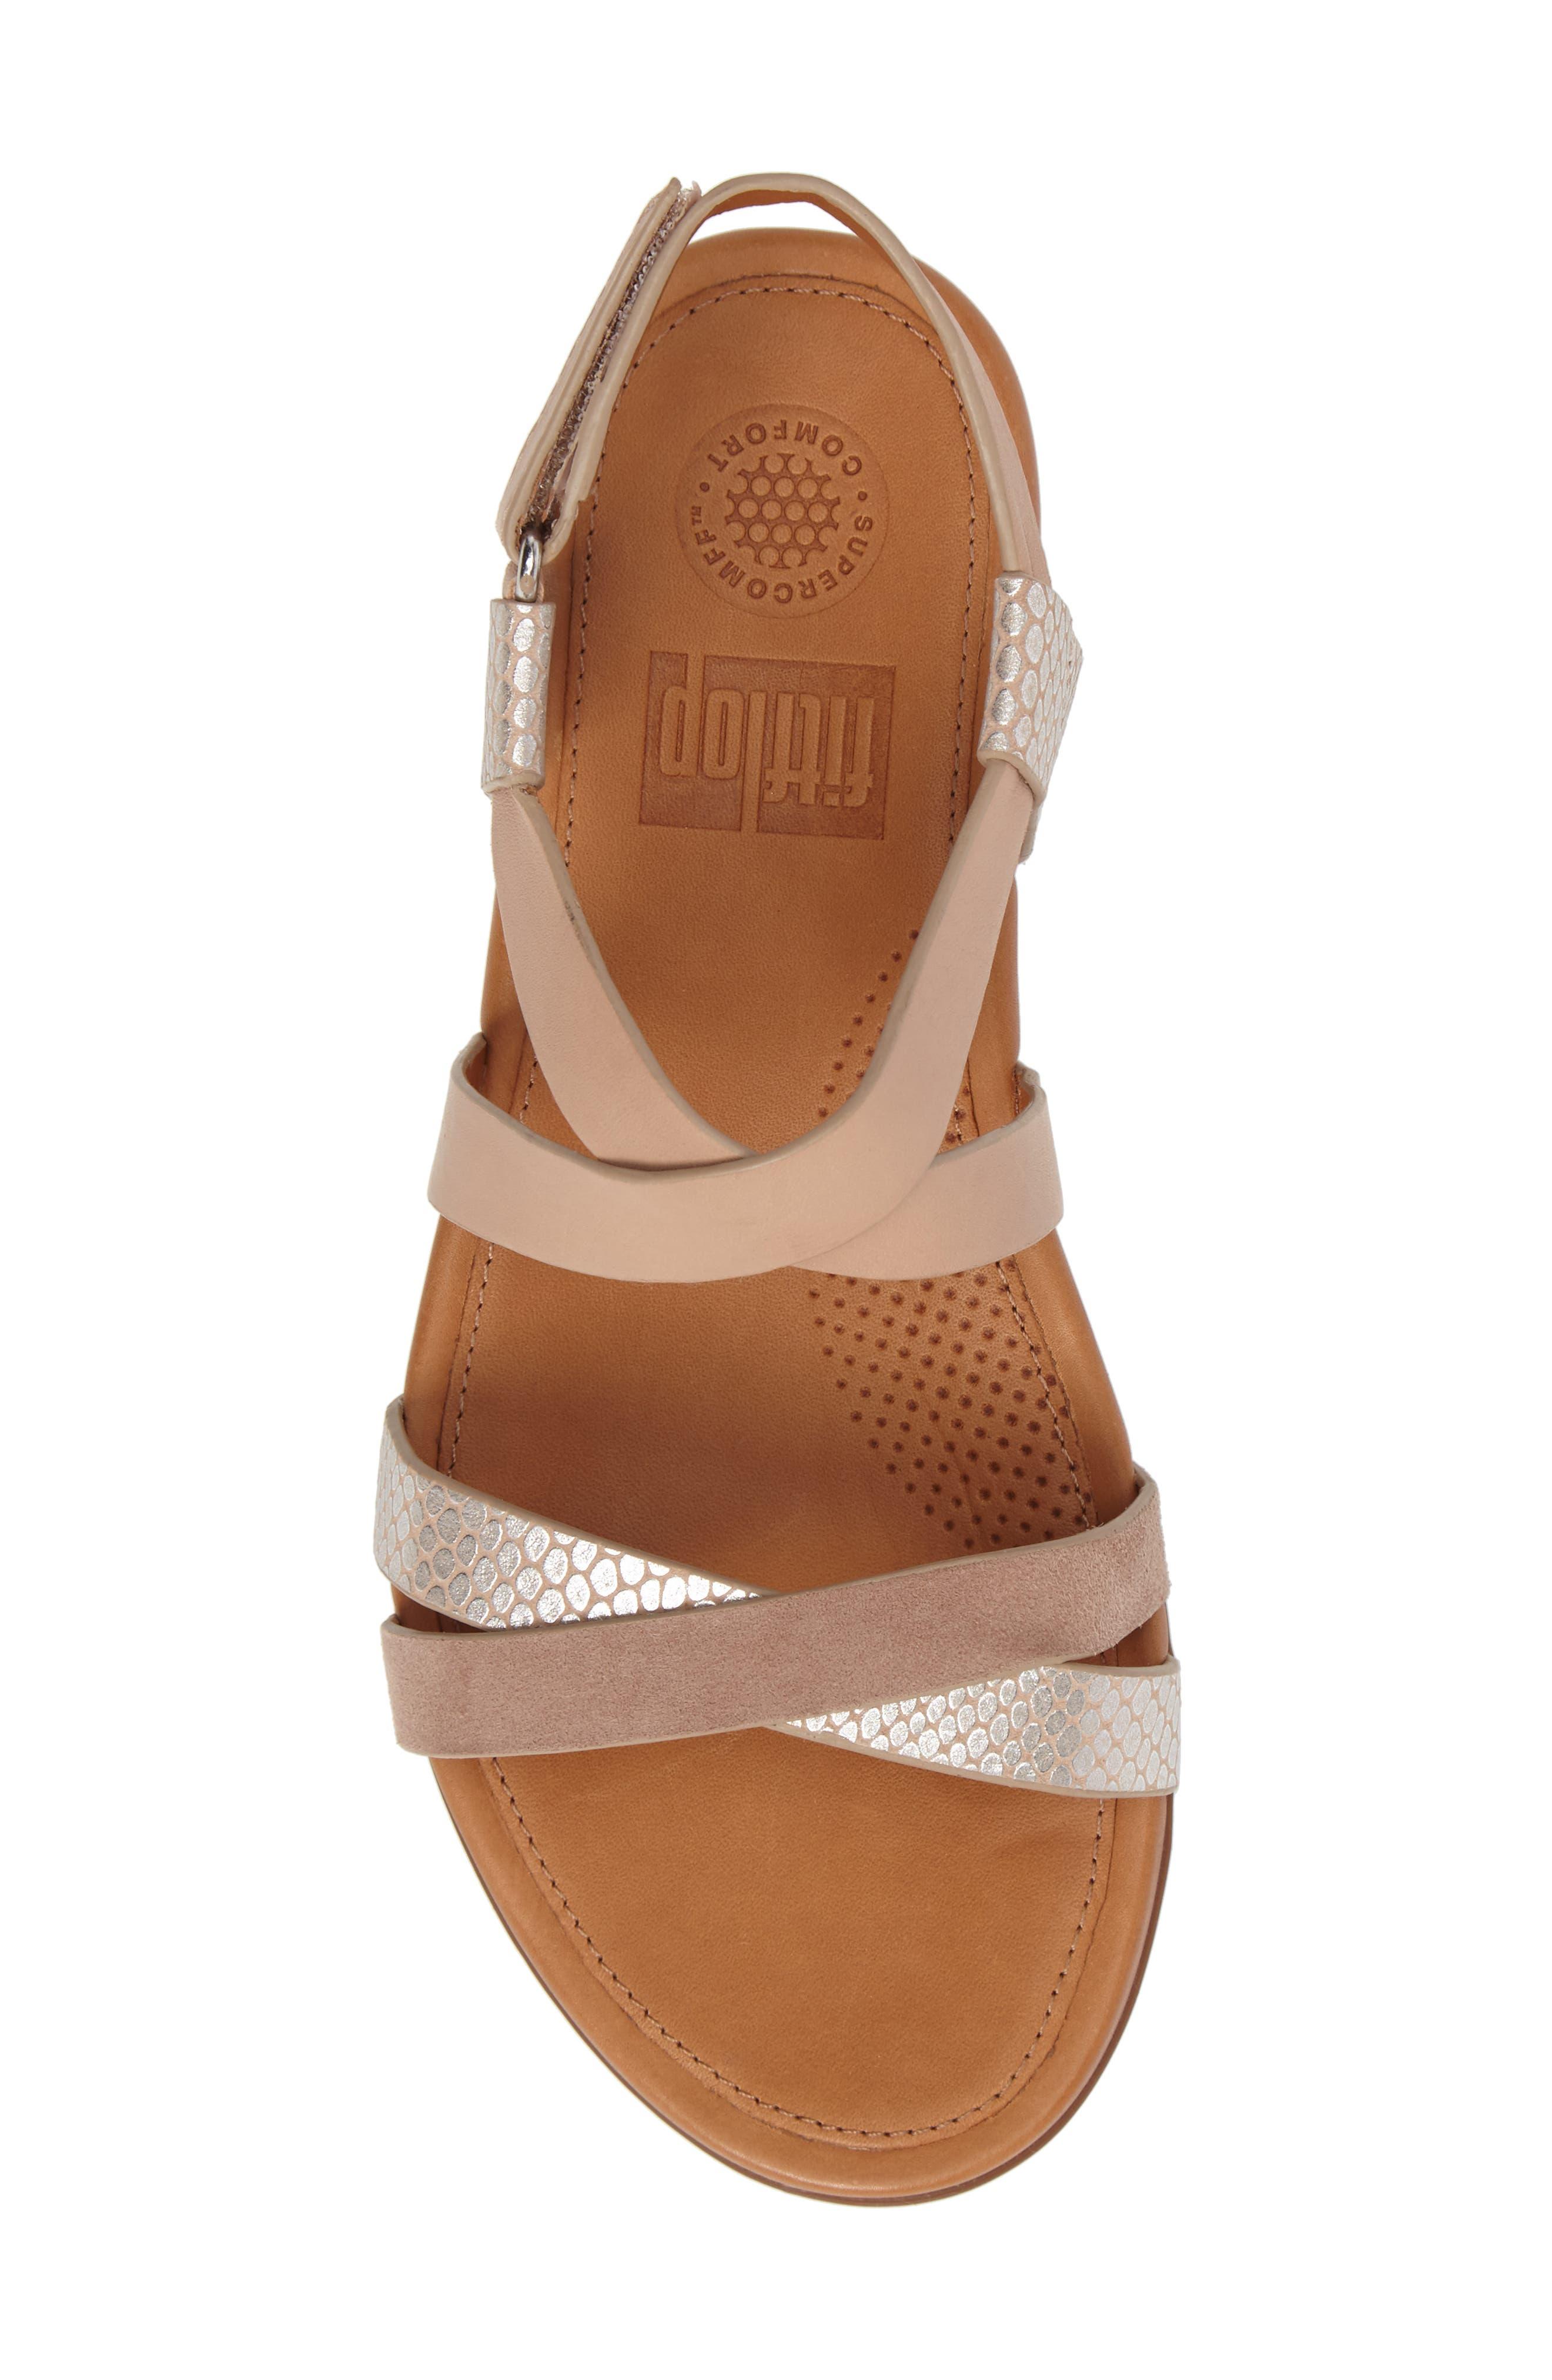 Lumy Crisscross Sandal,                             Alternate thumbnail 5, color,                             290